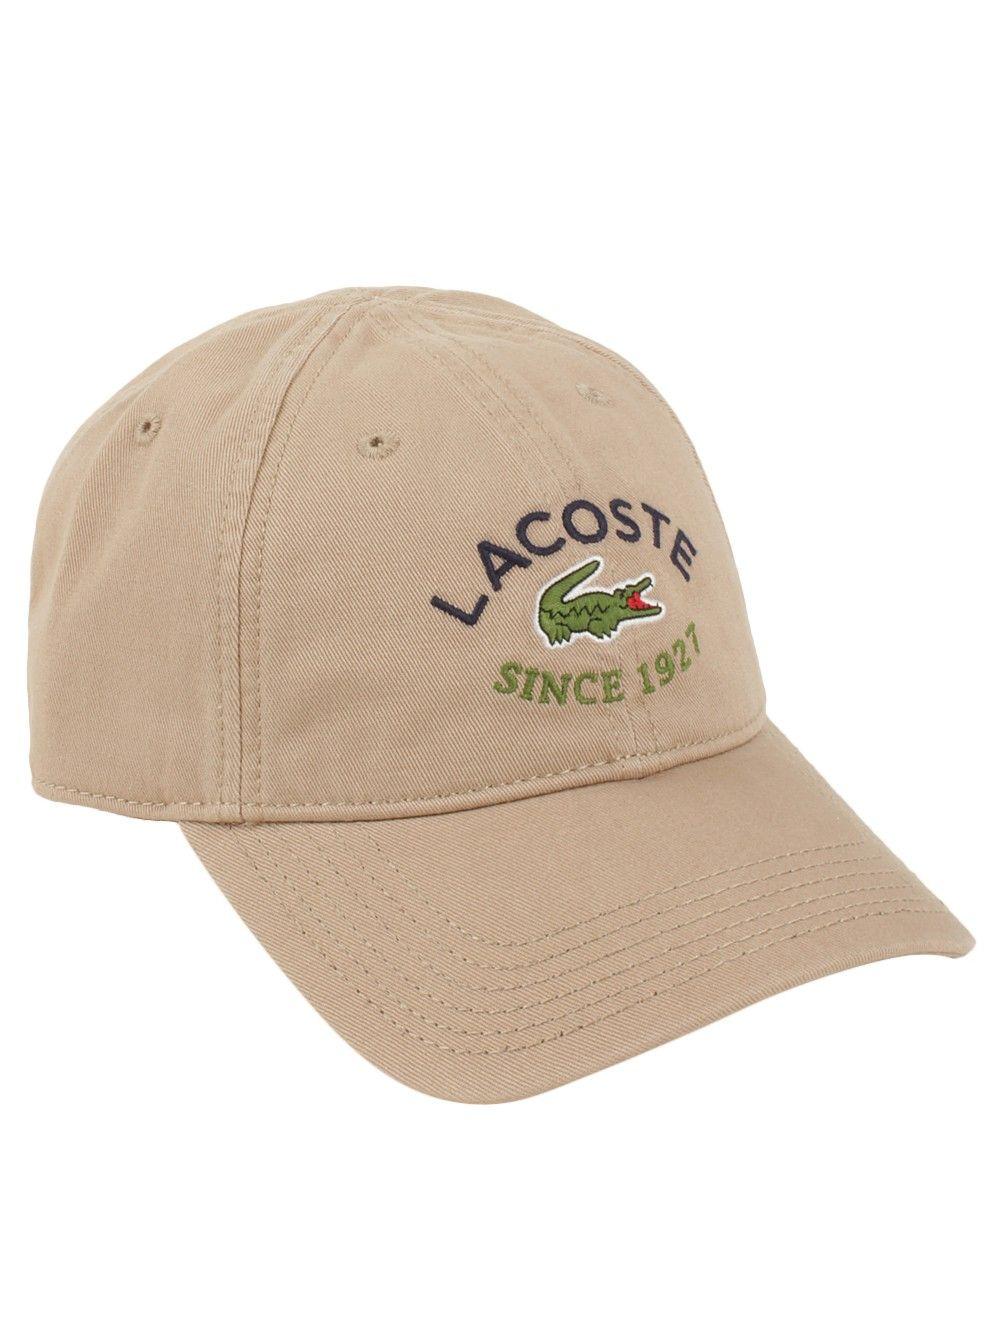 Lacoste® Men s Since 1927 Cap in Sahara Marine  a68826604c5